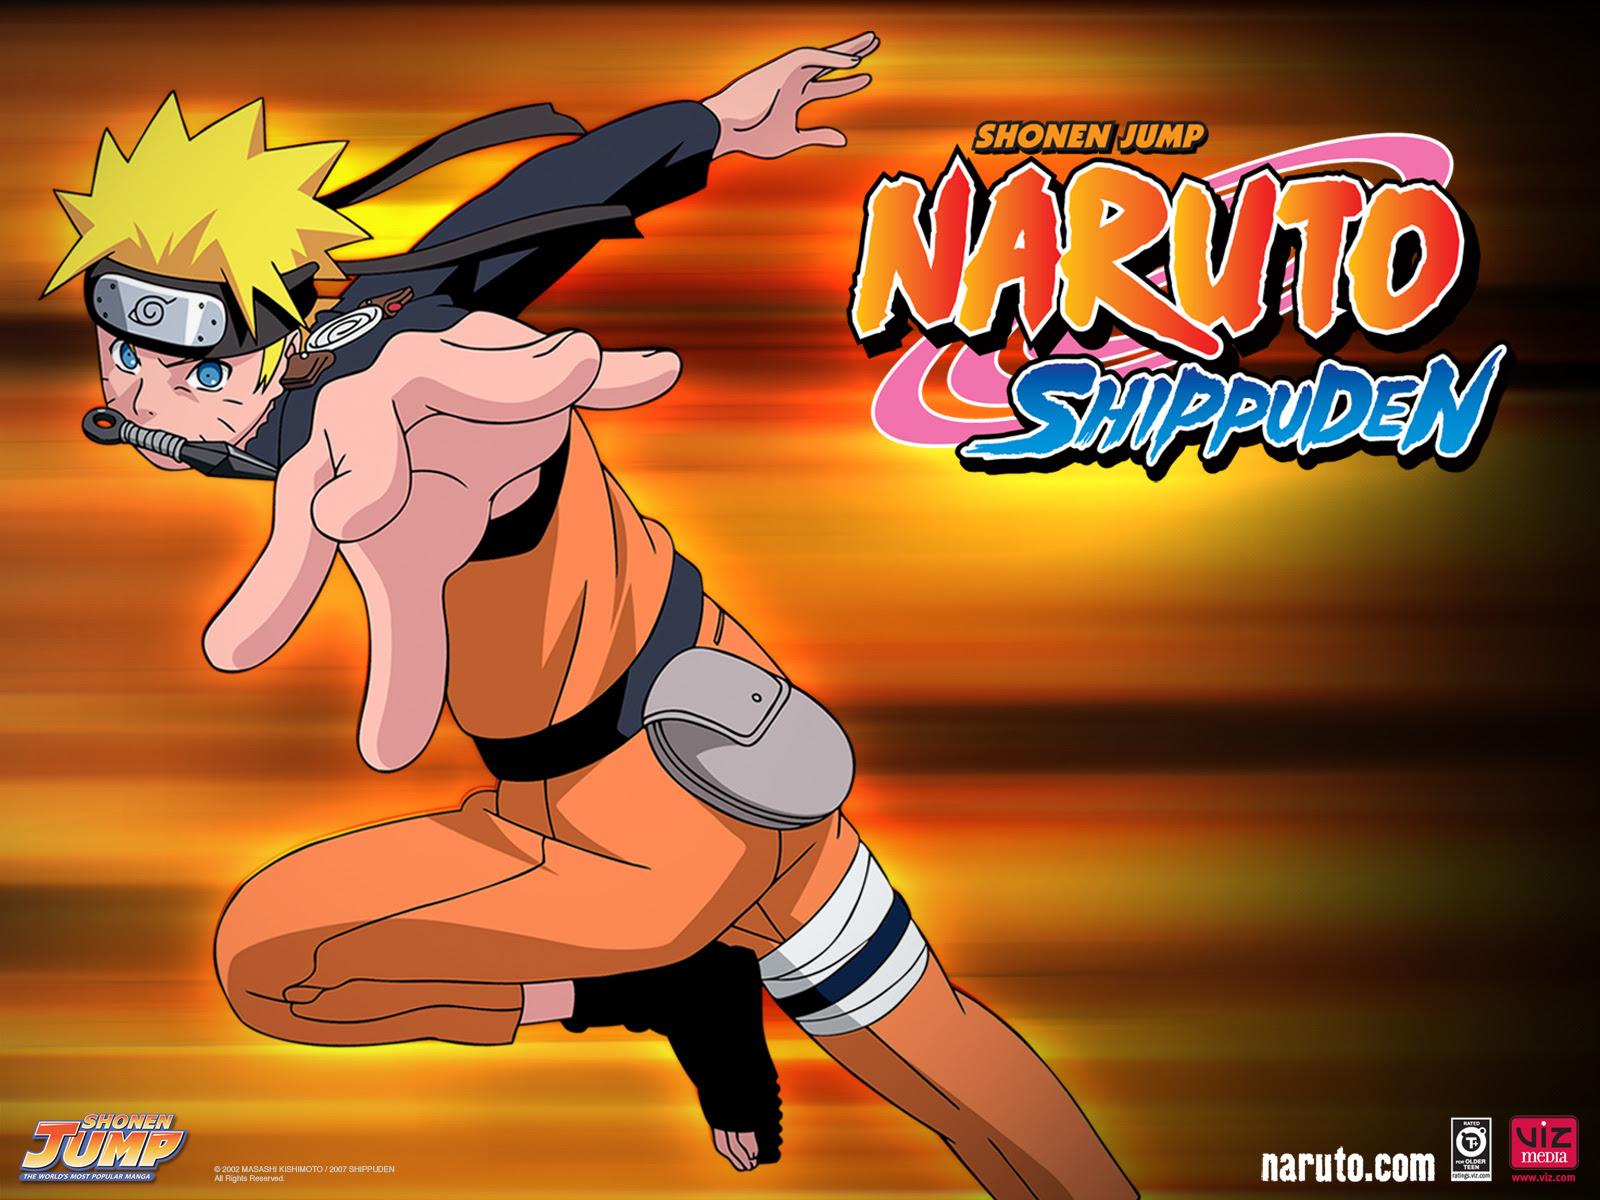 Naruto Shippuuden images Naruto Uzumaki HD wallpaper and background